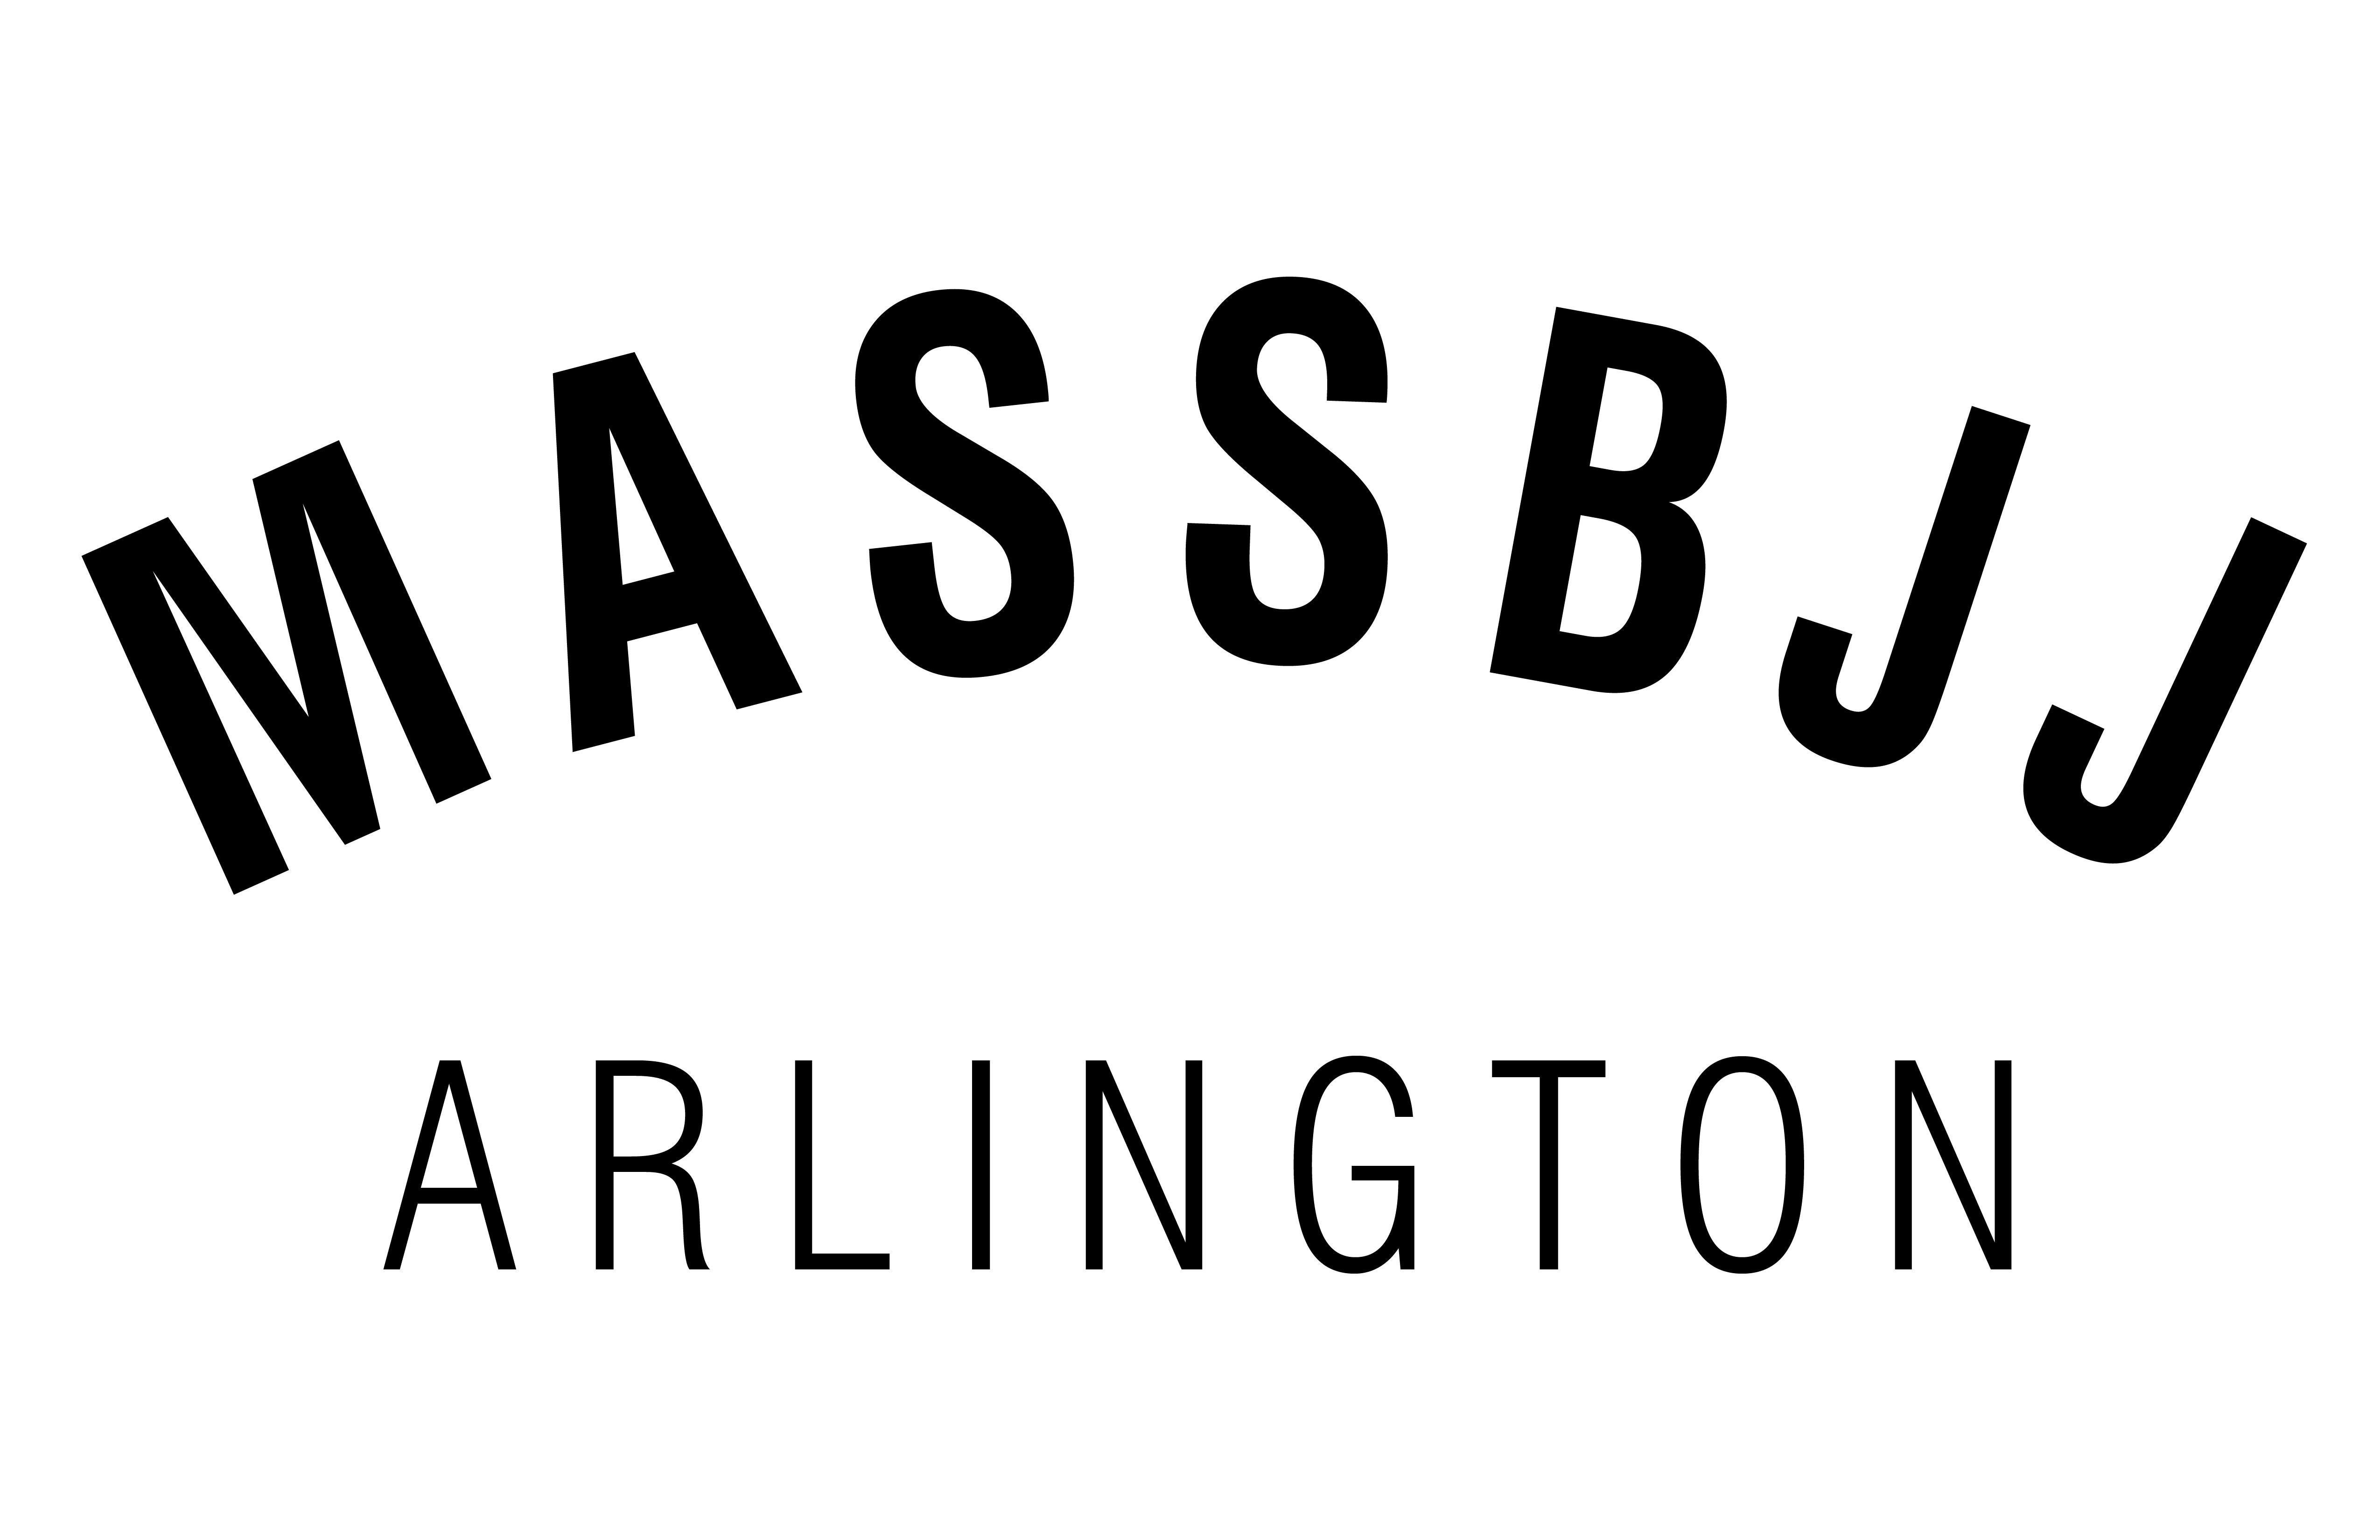 MassBJJ-Arlington logo